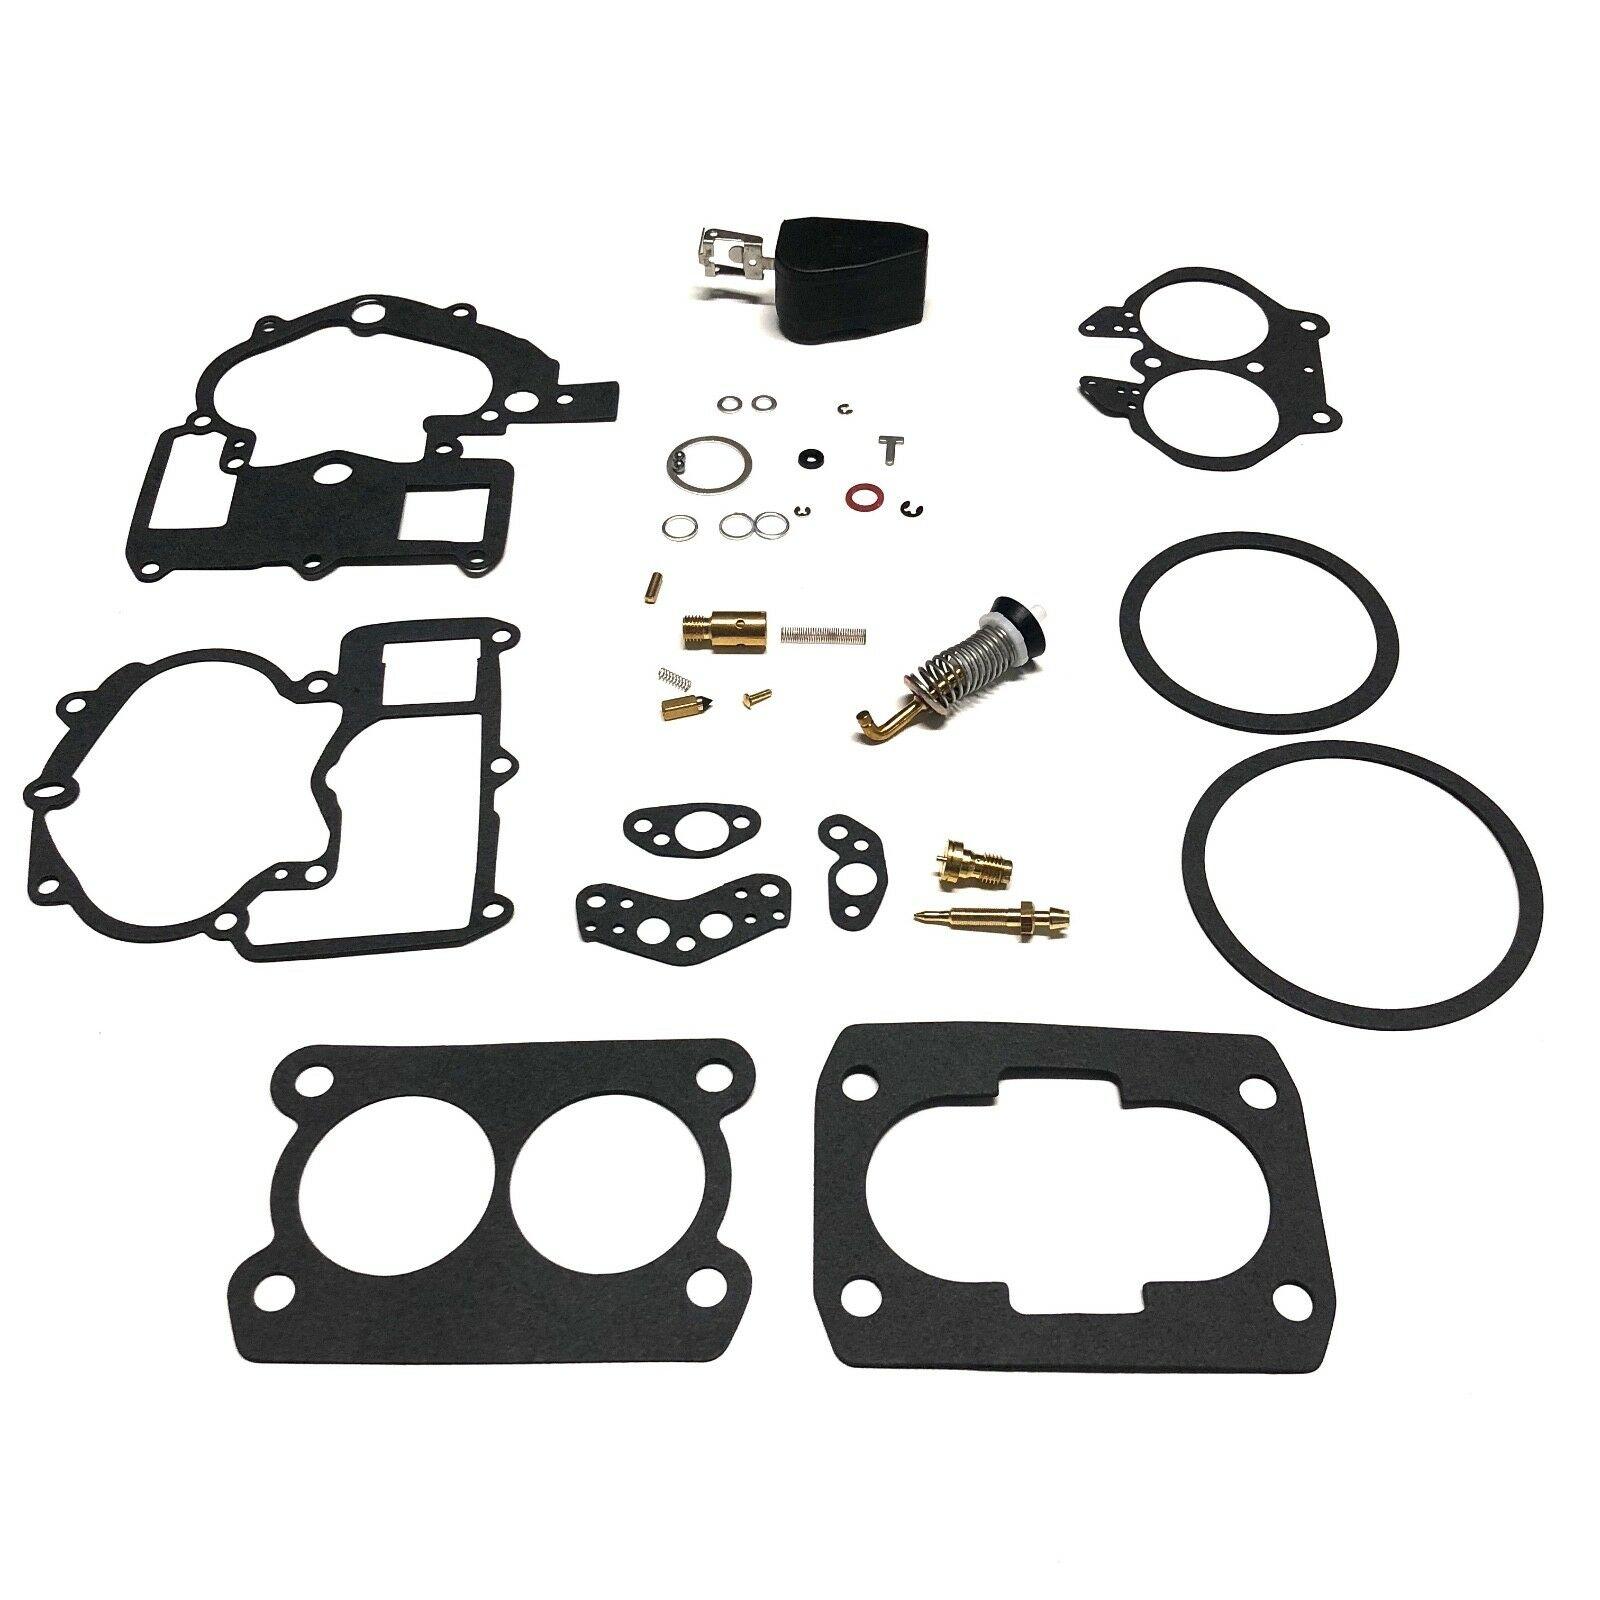 Carburador Reconstruir Kit para Reconstruir Kit de Reparo do Carburador para Mercruiser Mercury Mercury Marine Marine 3.0L 4.3L 5.0L 5.7L